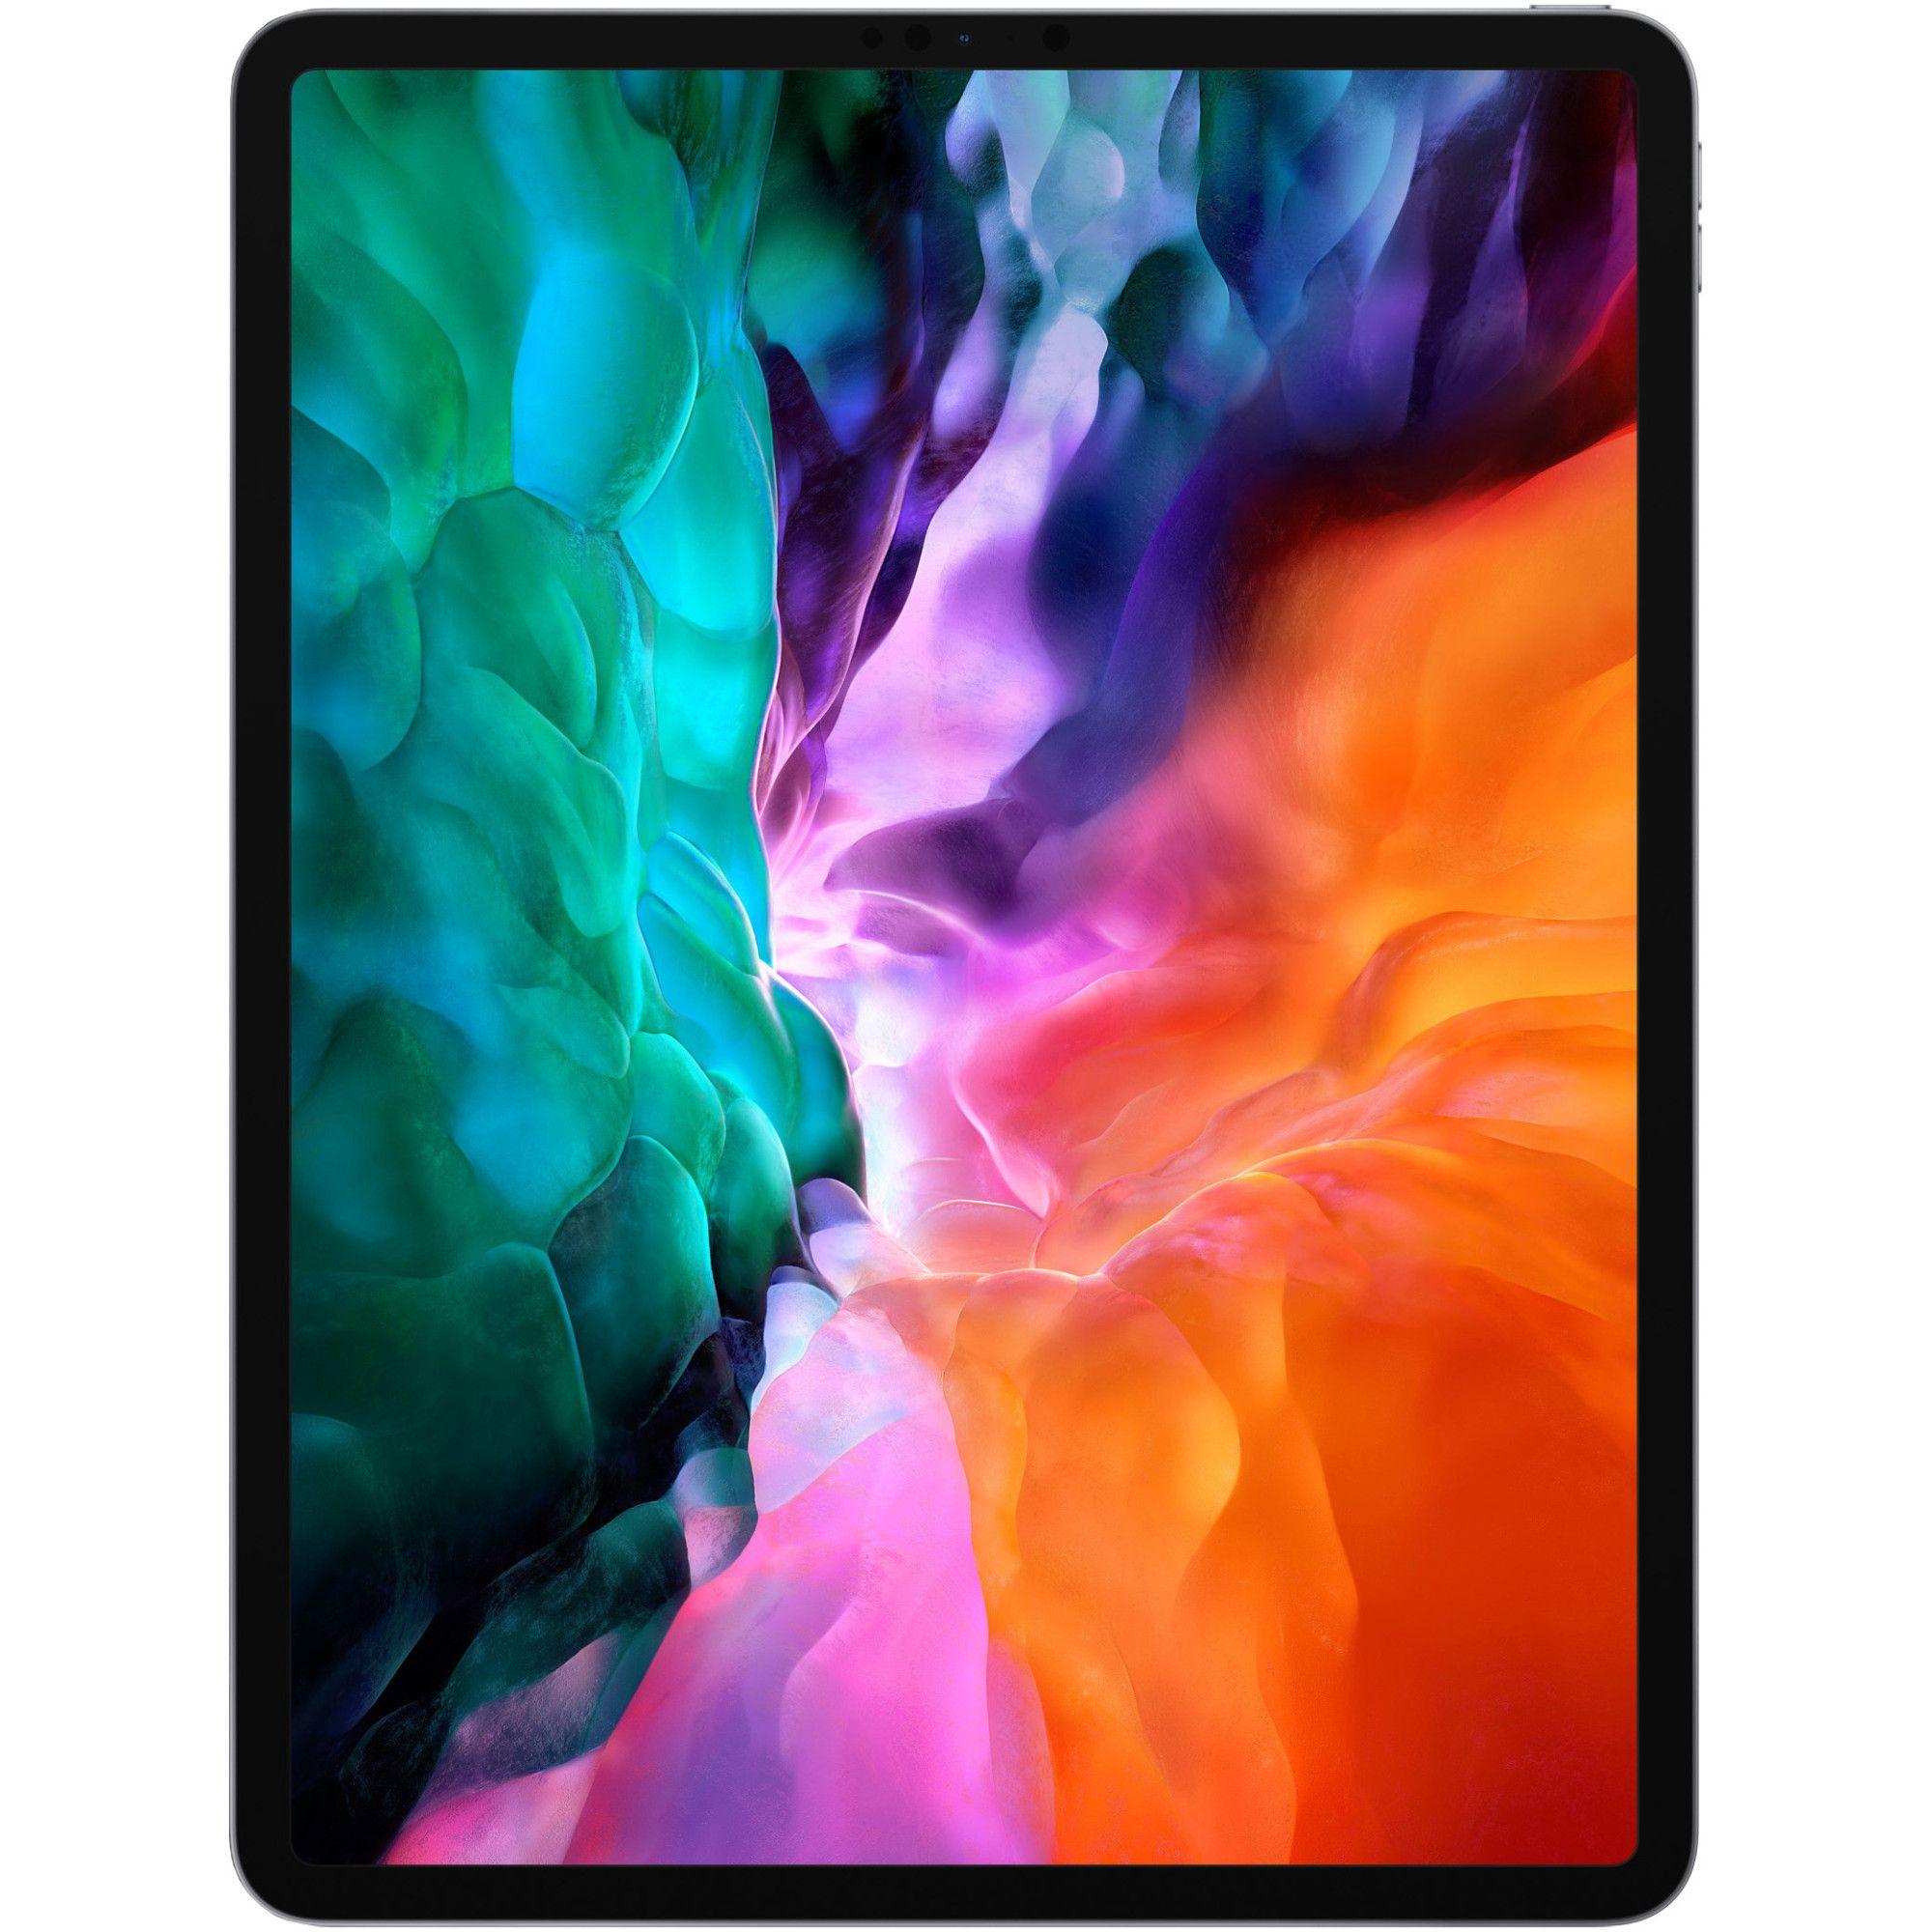 Tableta Apple iPad Pro 11 (2020) 128GB Flash 6GB RAM WiFi + 4G Space Grey